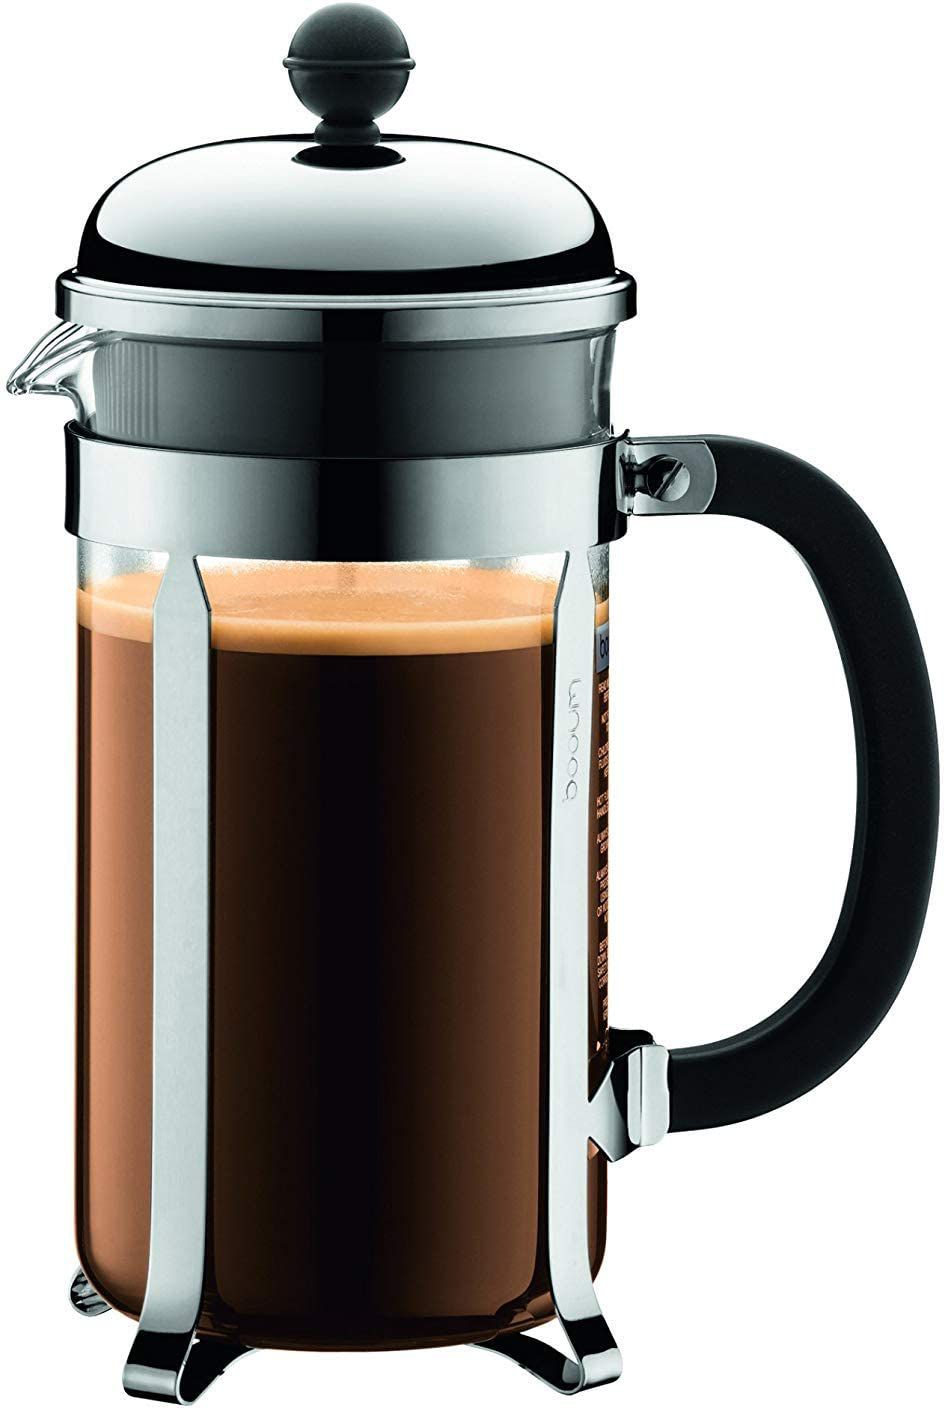 Bodum-Chambord-French-Press-Coffee-Maker